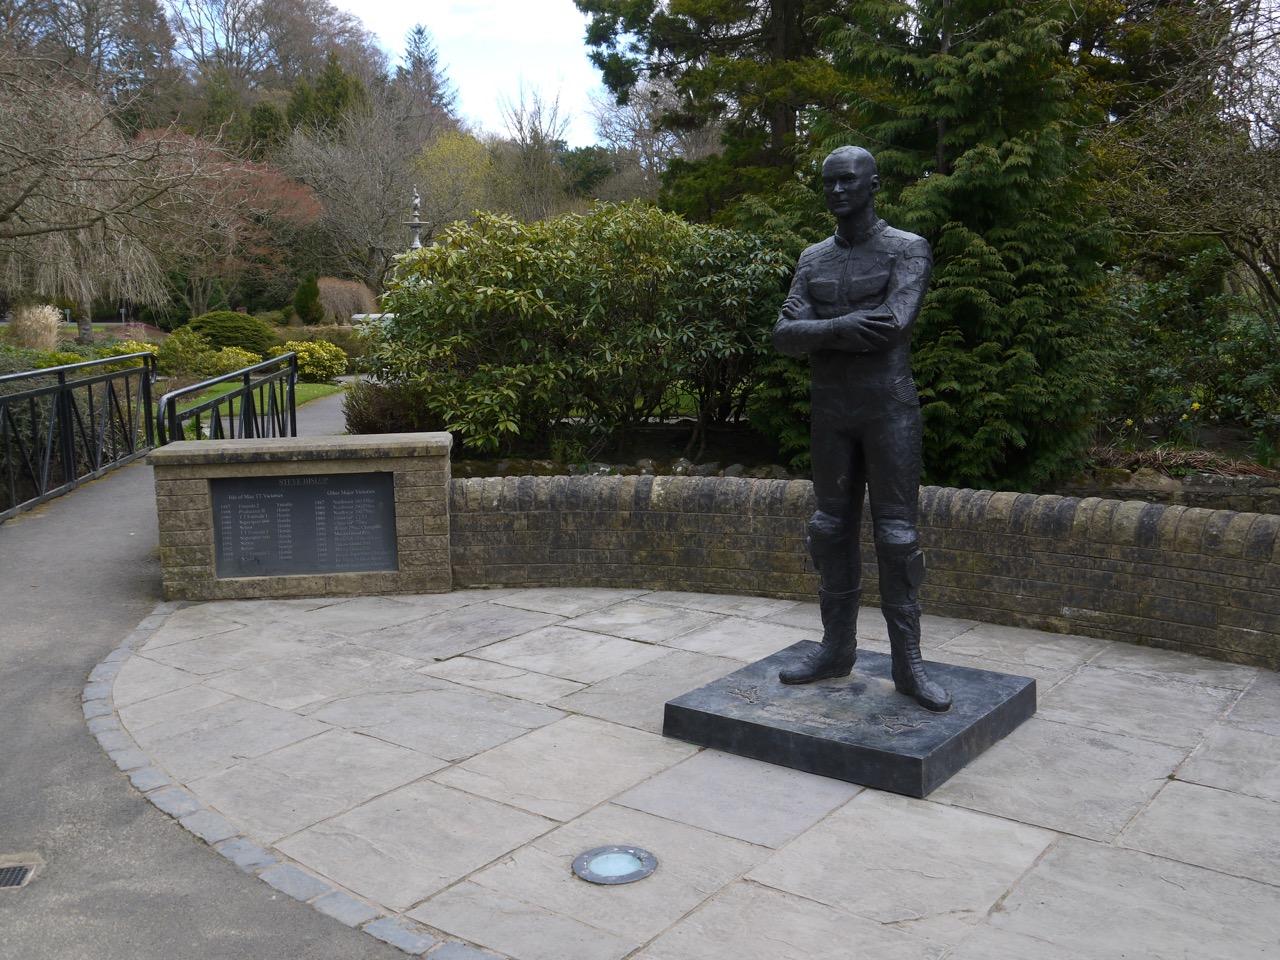 Steve Hislop's statute